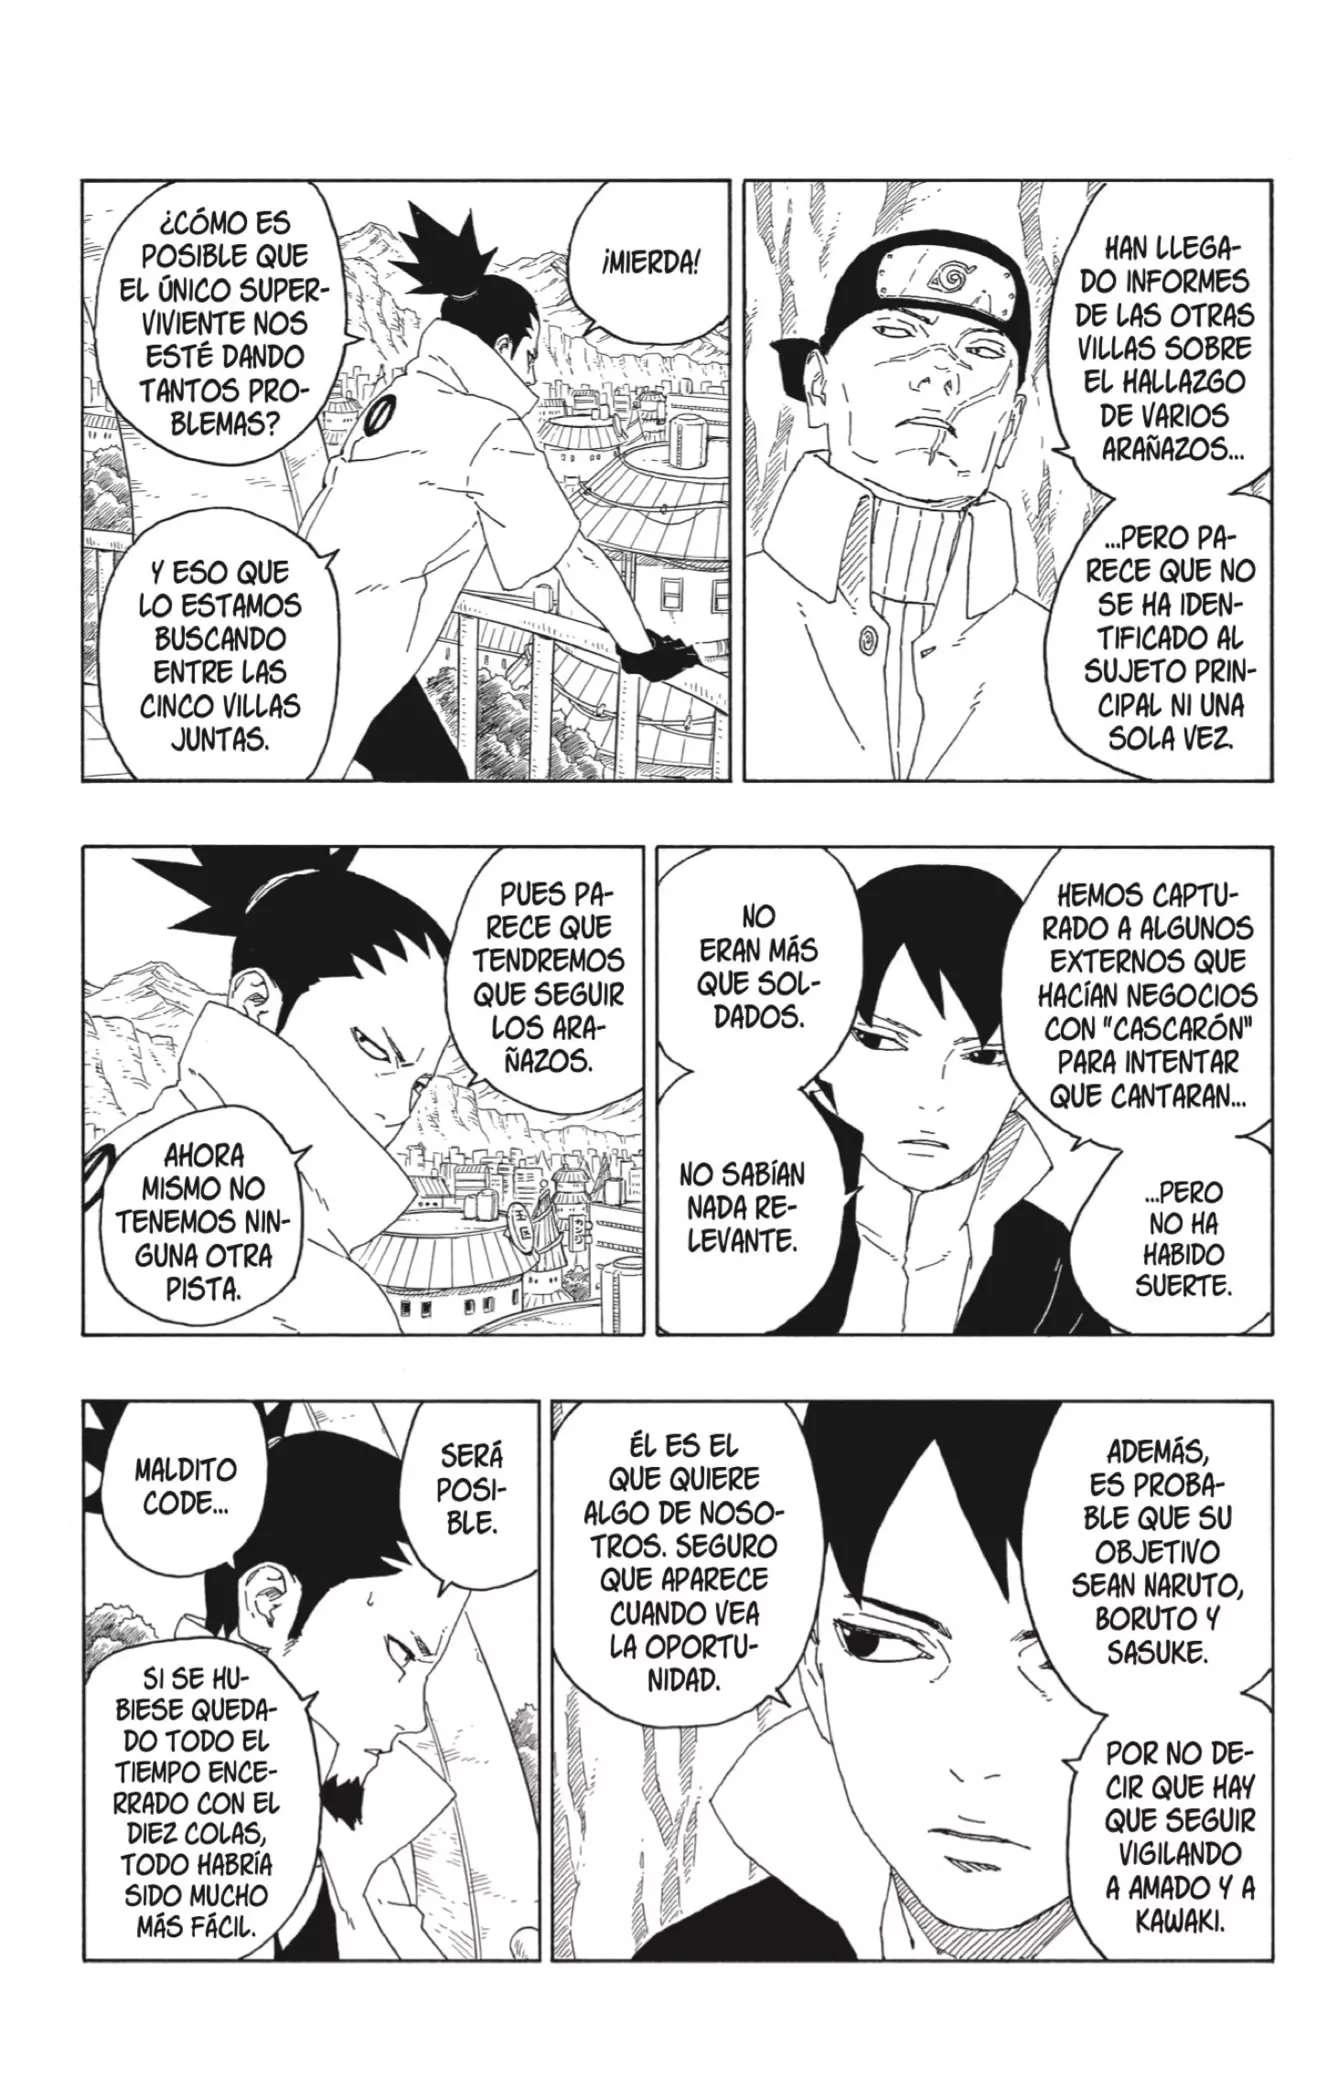 Boruto Manga Capitulo 60, image №3